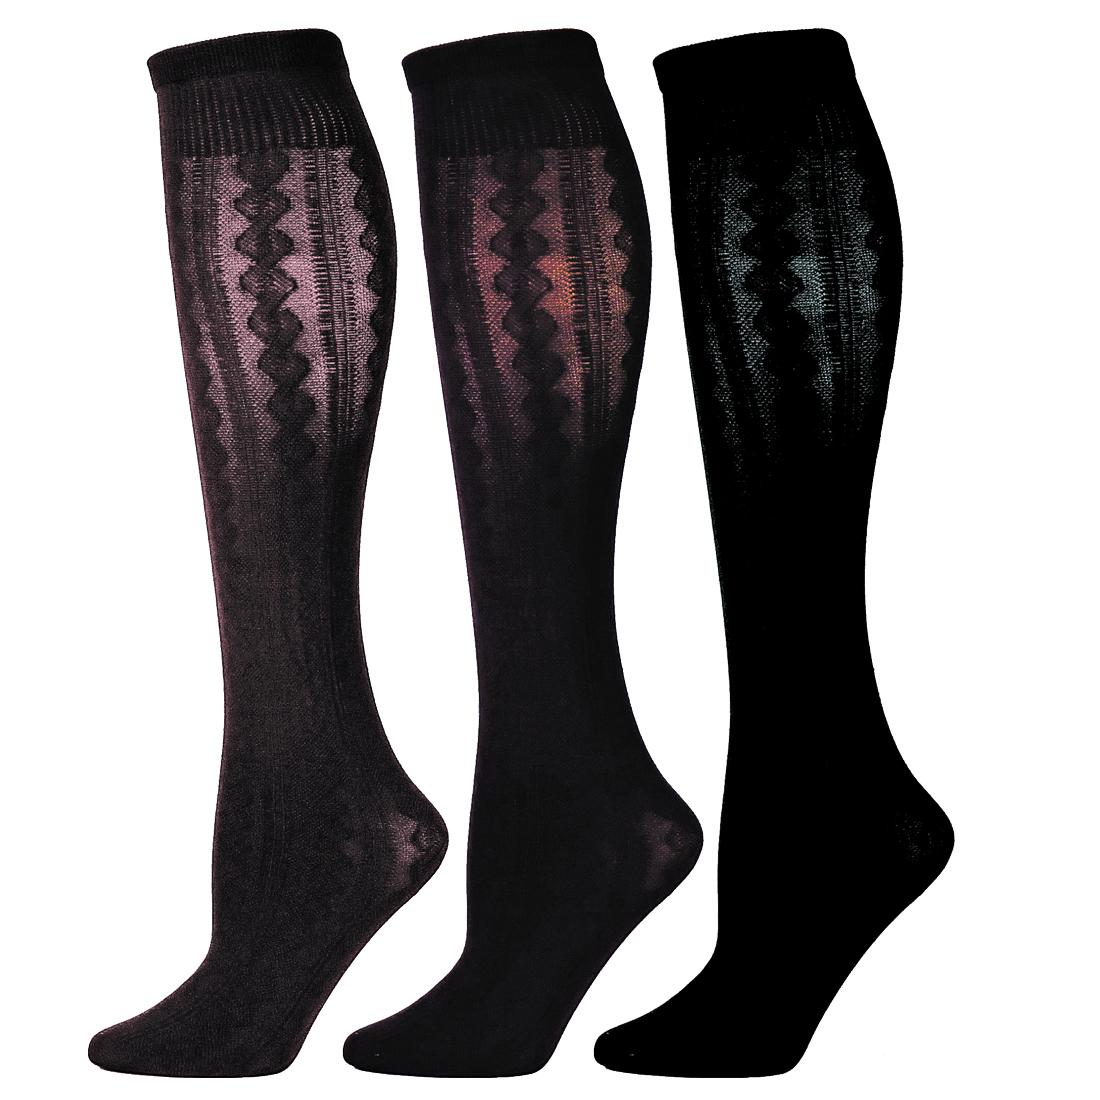 B.ella Tisha Womens Cotton Cable Trouser Sock (Medium - Knee High) | EBay